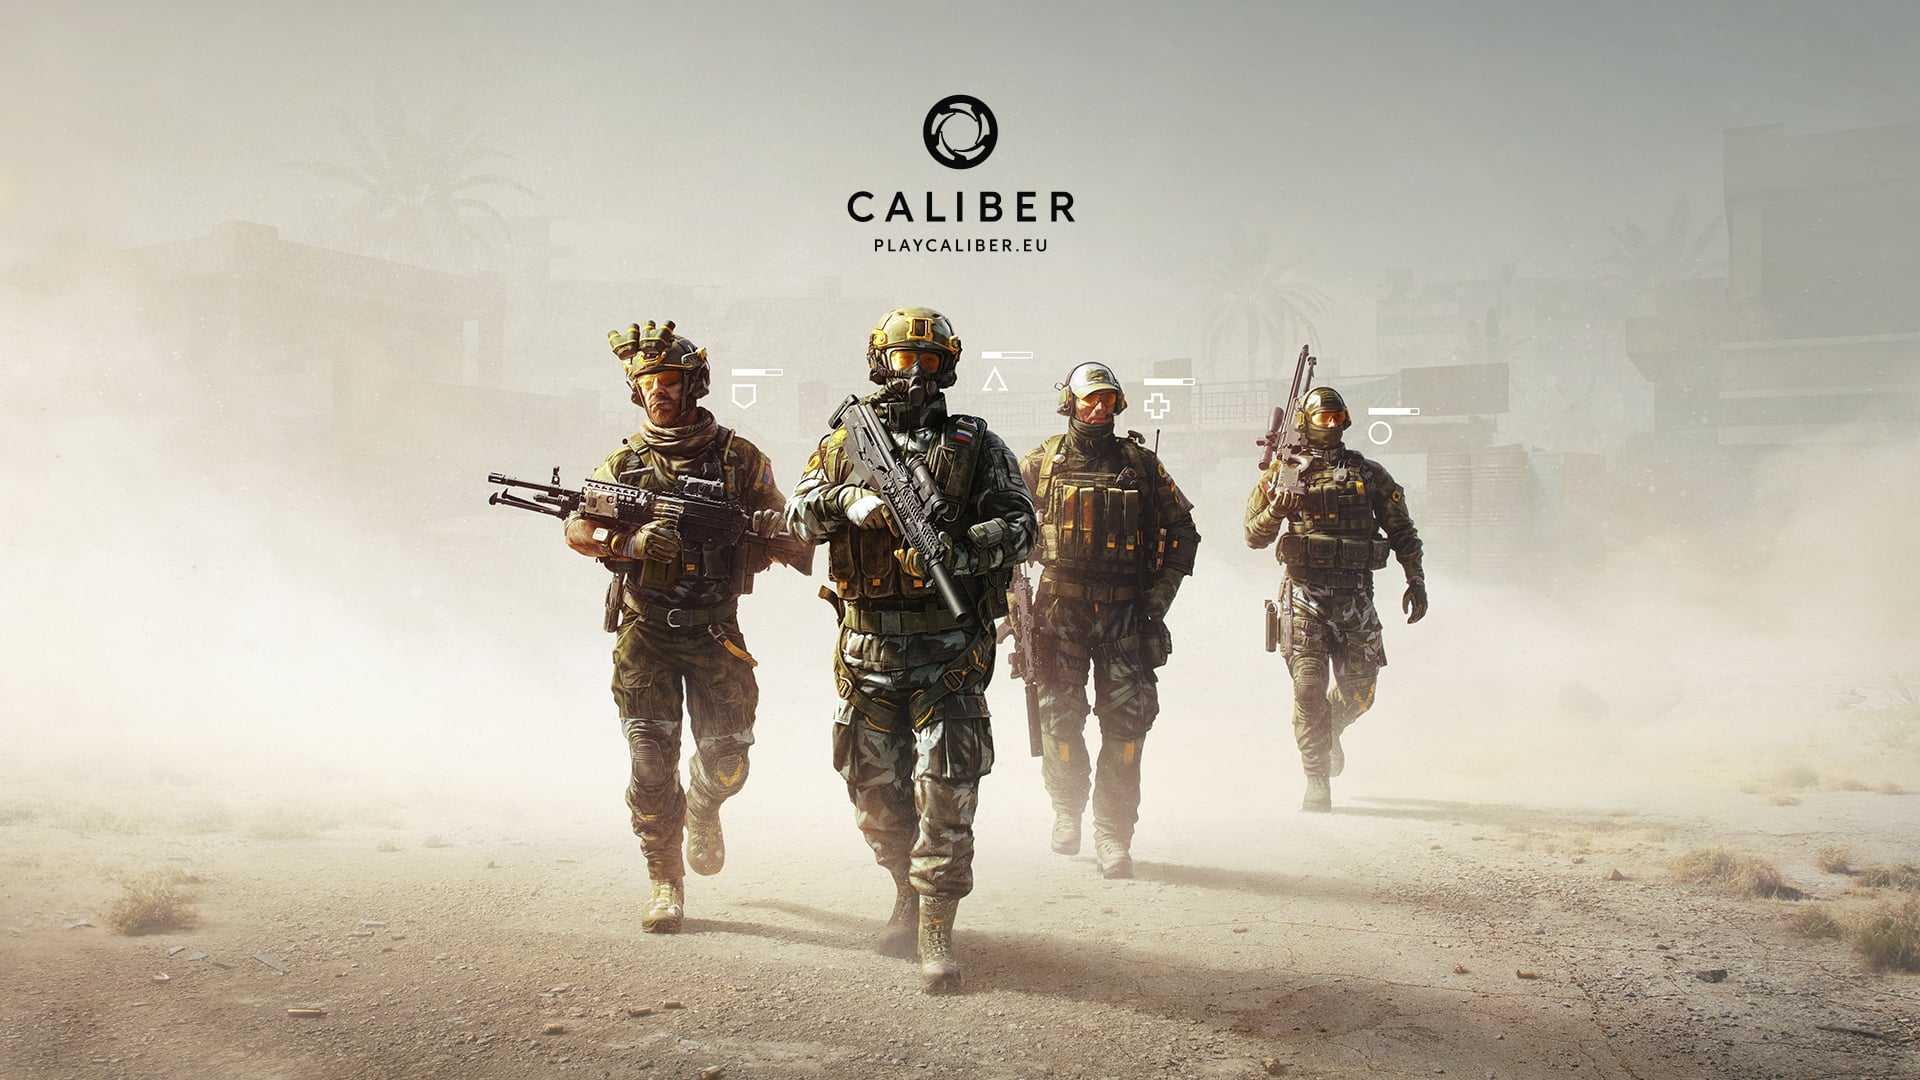 Caliber Announced